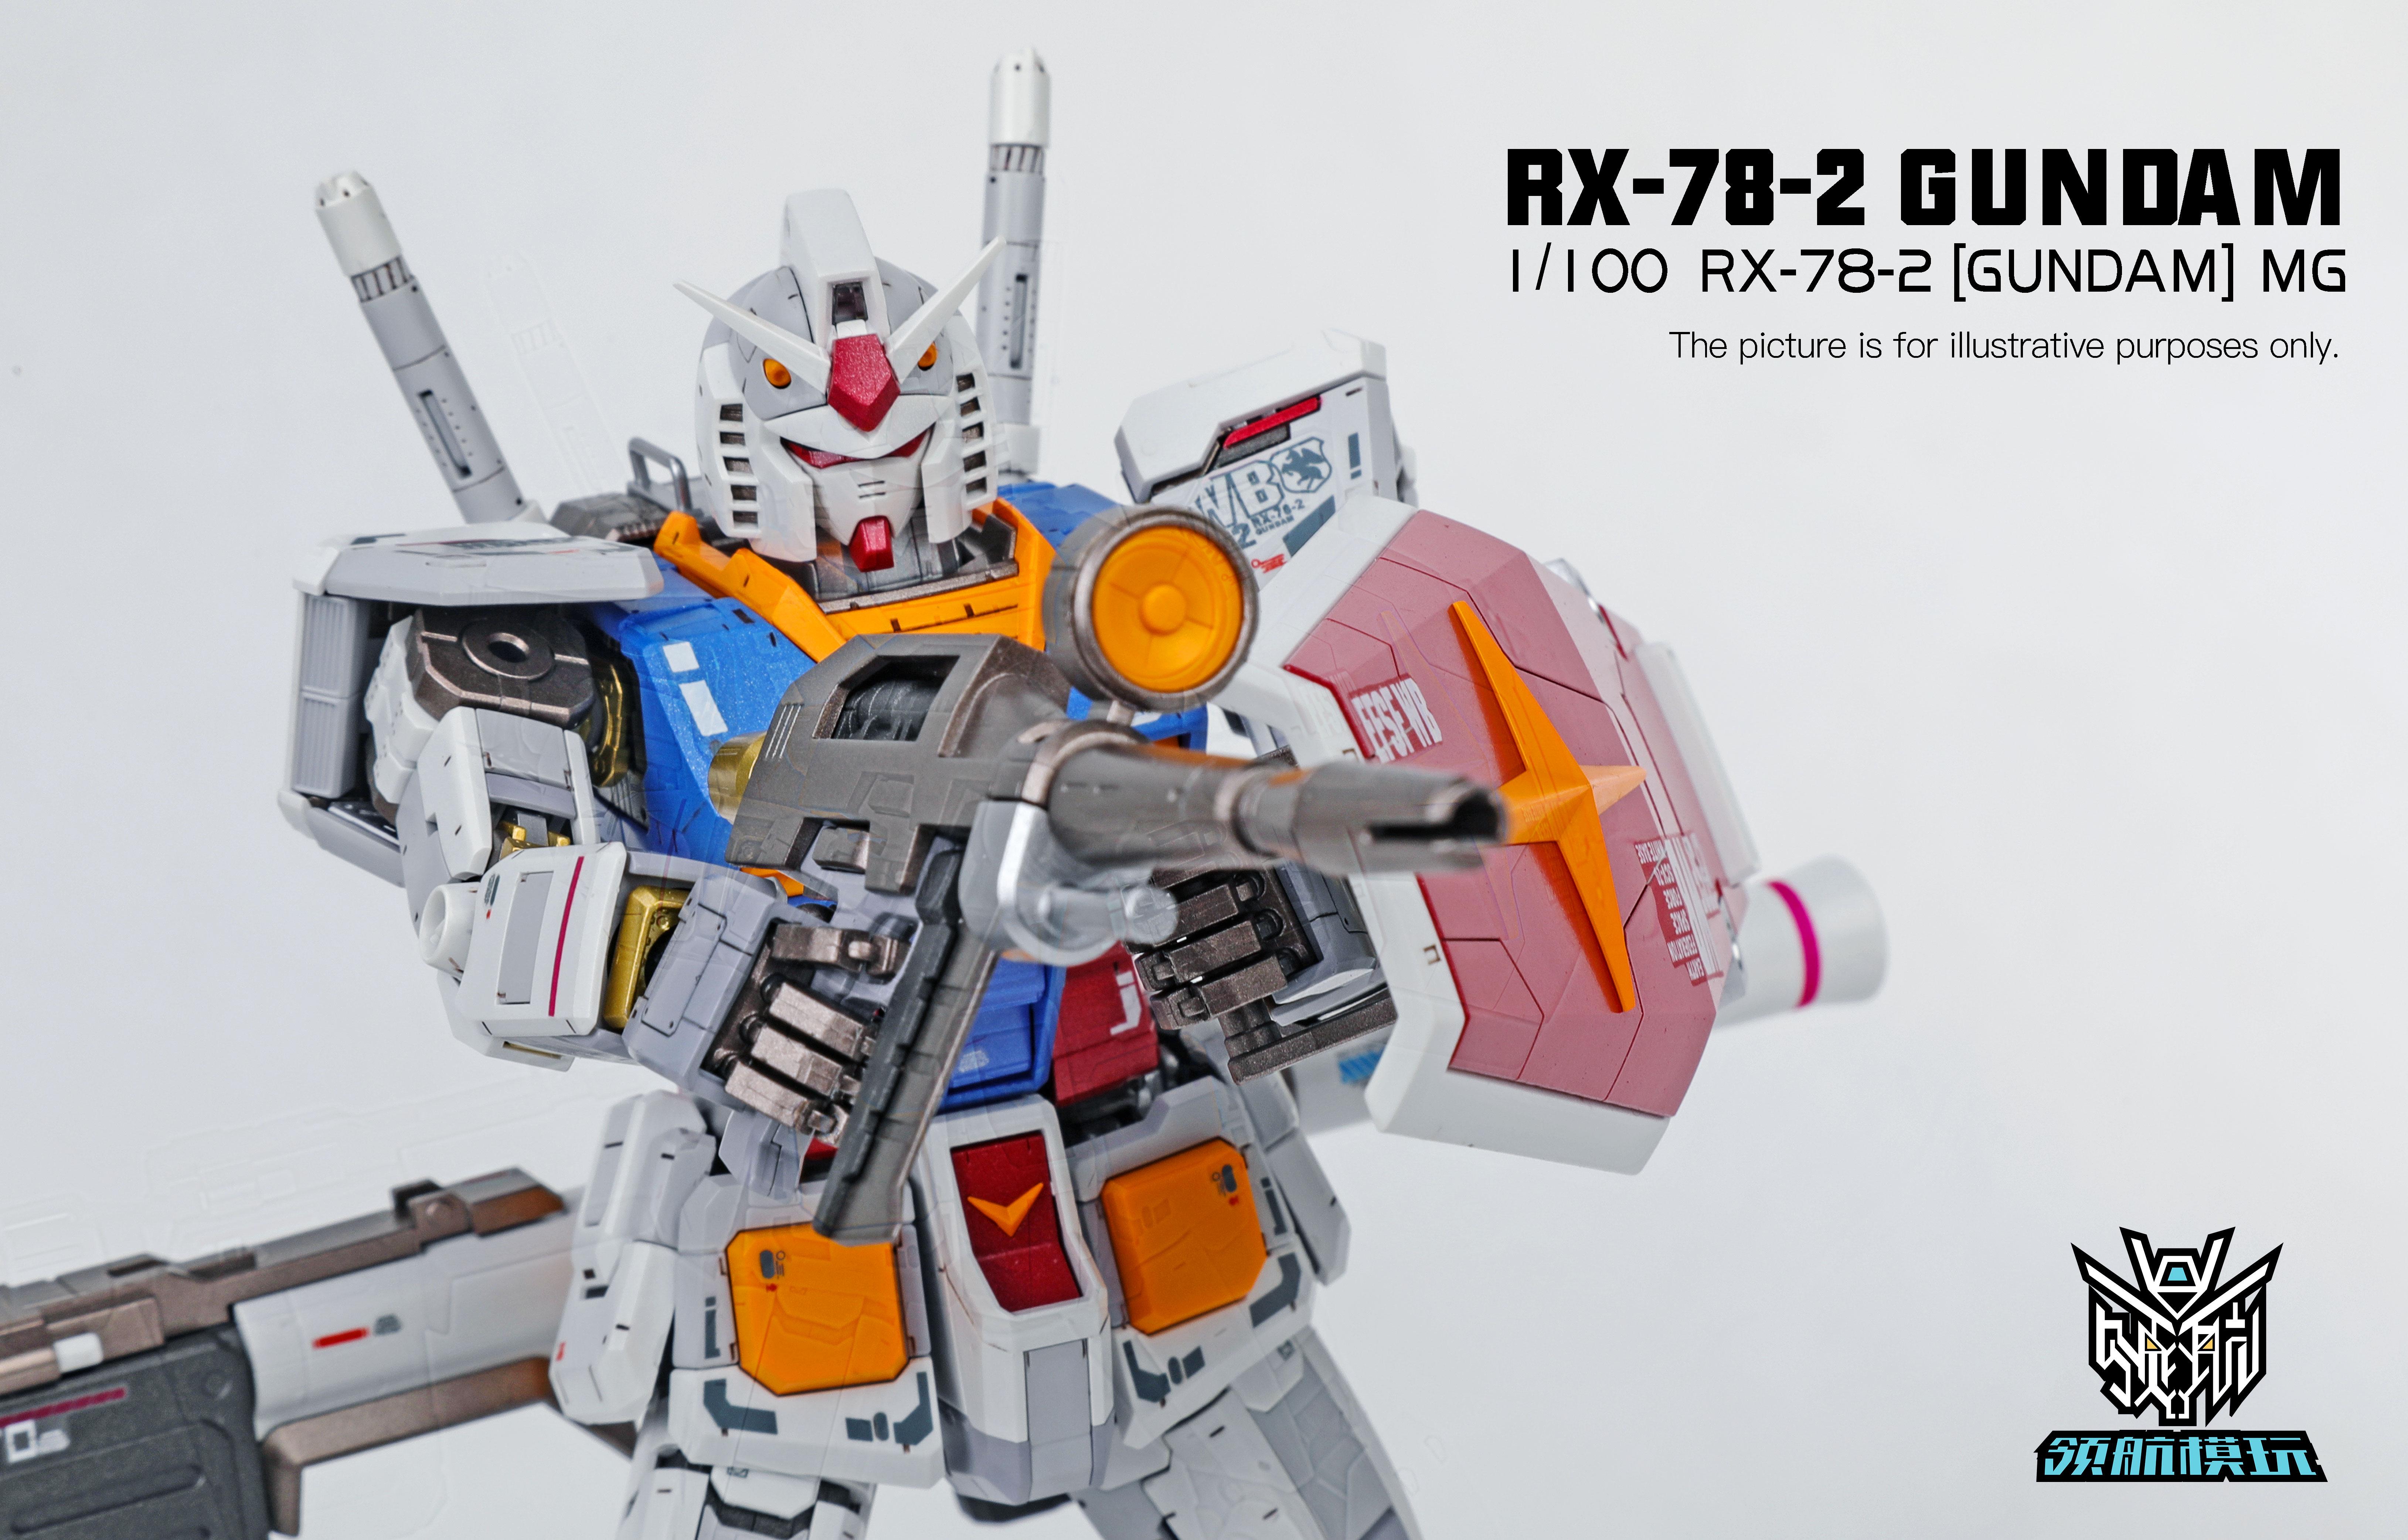 S612_navigator_MG_rx_78_009.jpg